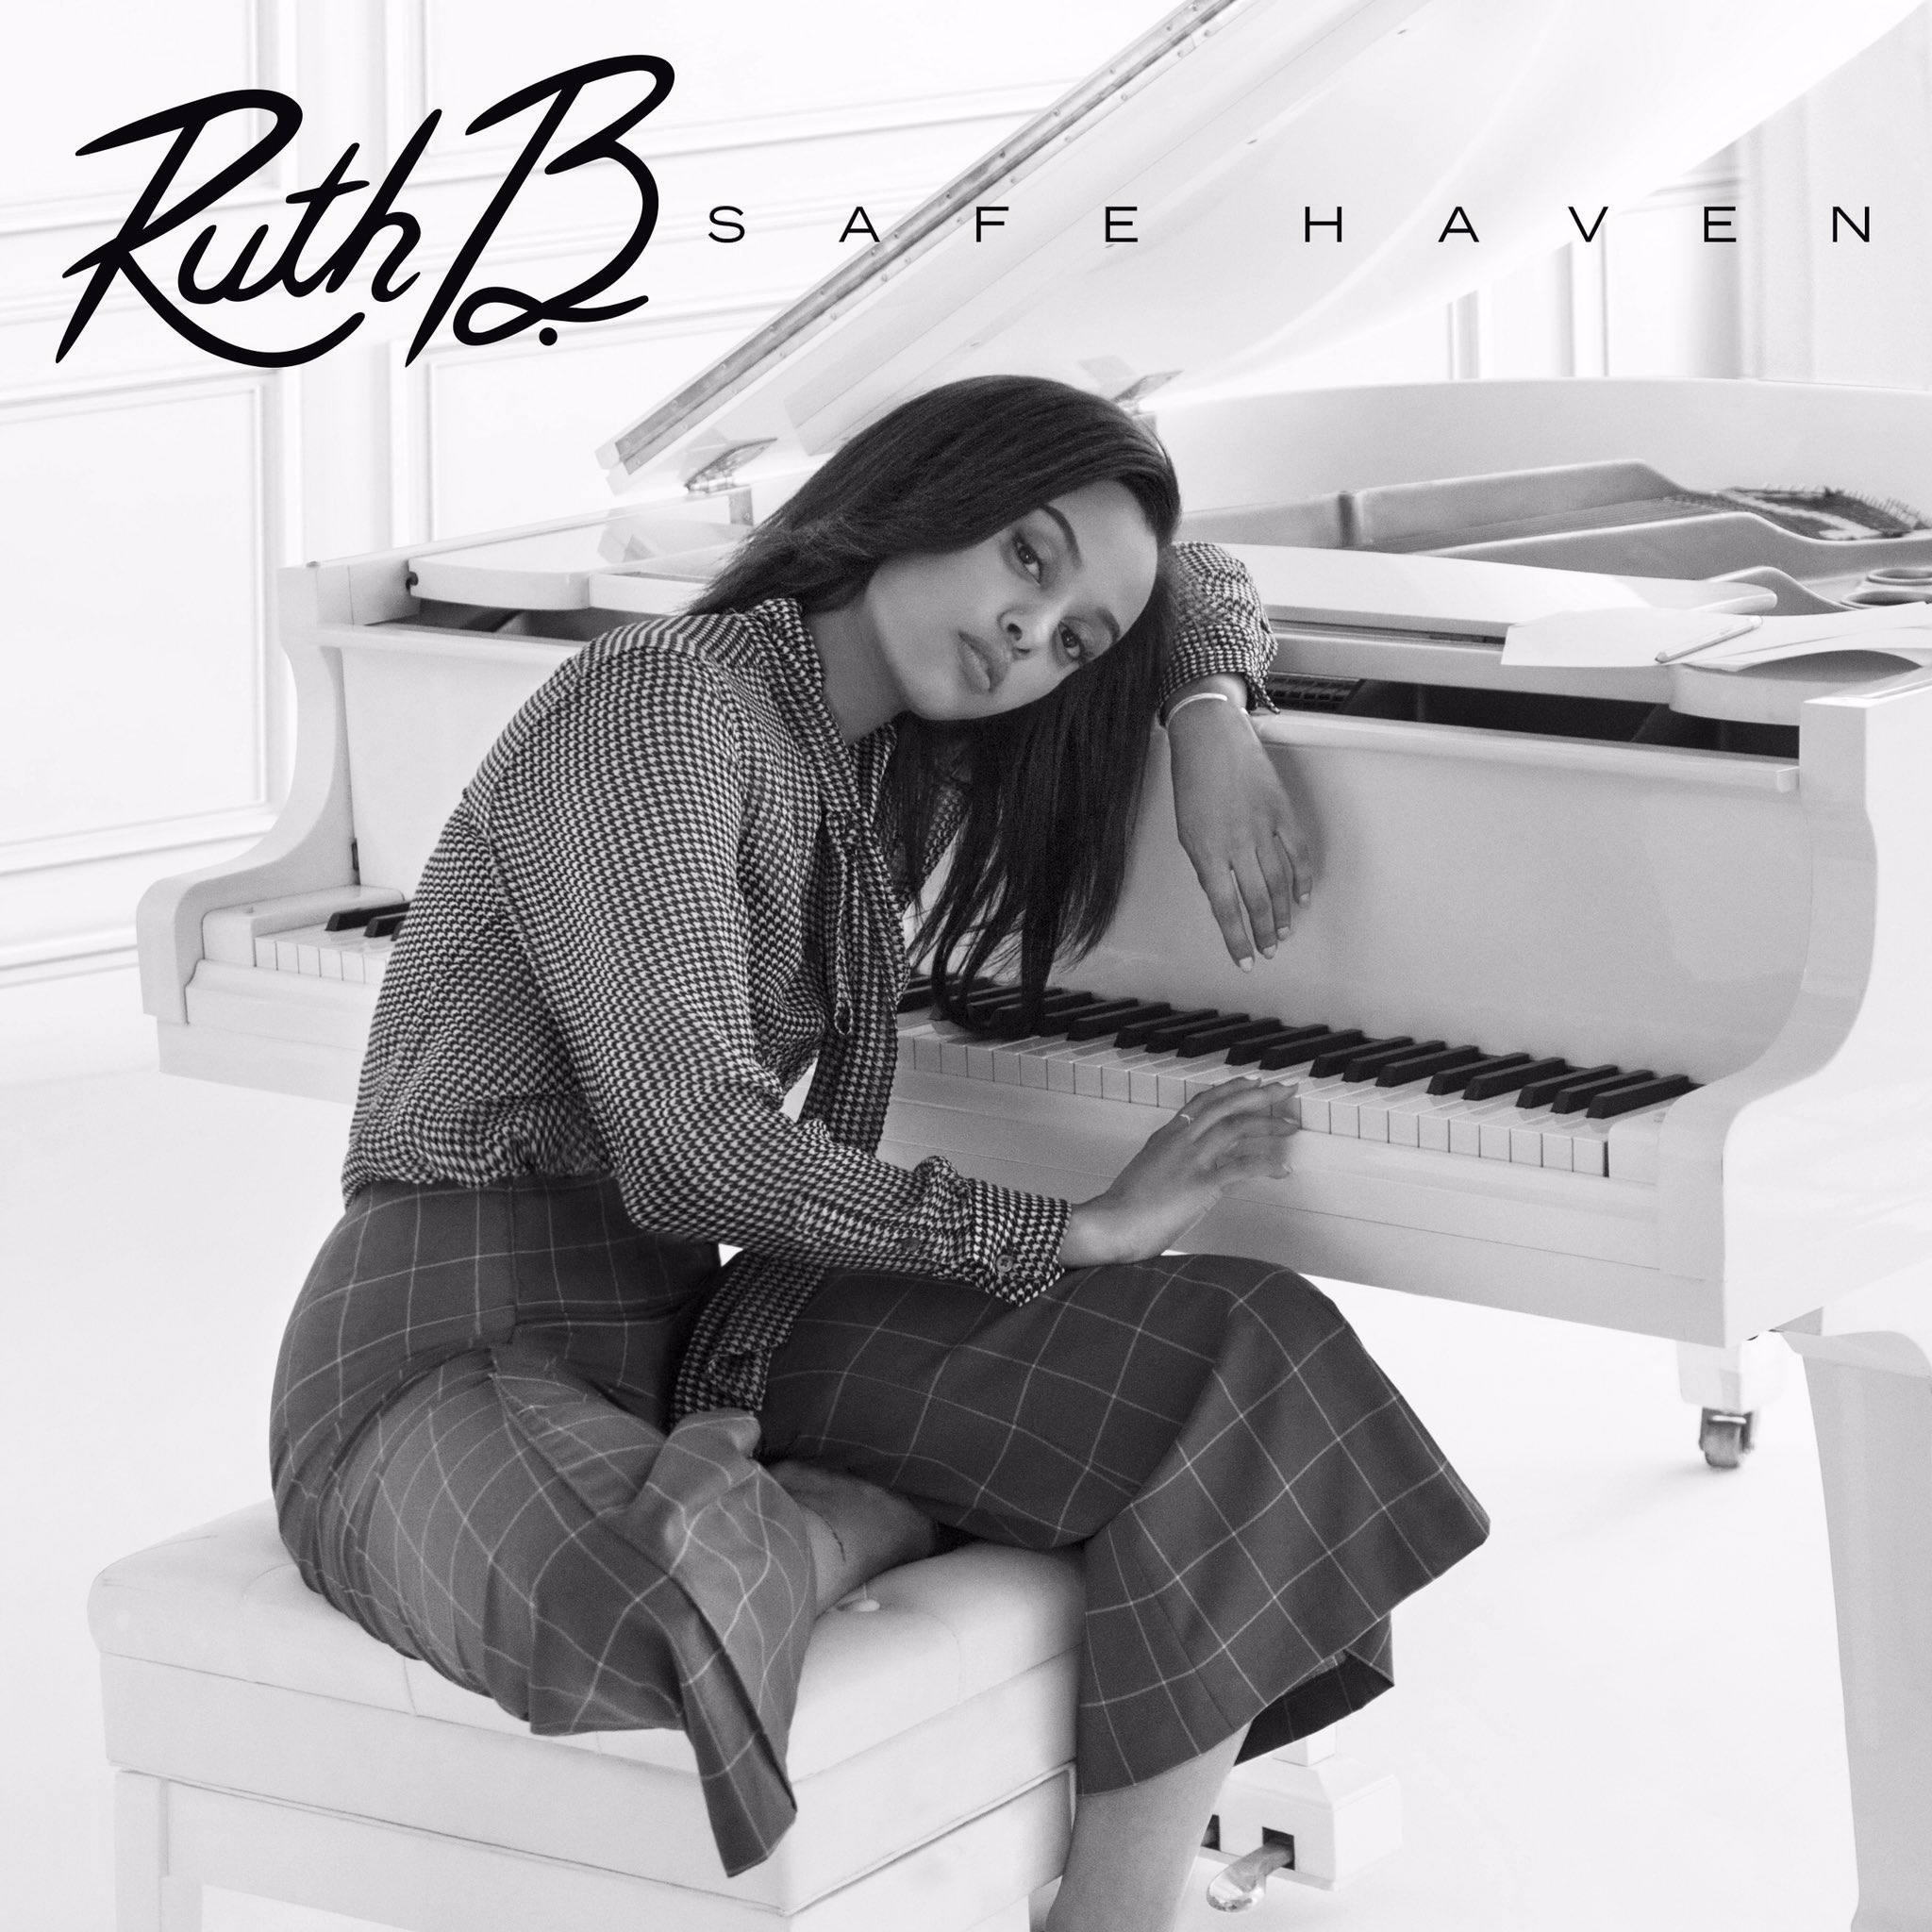 "<a href=""https://www.facebook.com/RuthBMusic/photos/a.462041580636140.1073741827.449430555230576/744647052375590/?type=1&theater""> Edmonton local Ruth B will perform. (Ruth B/Facebook)</a>"